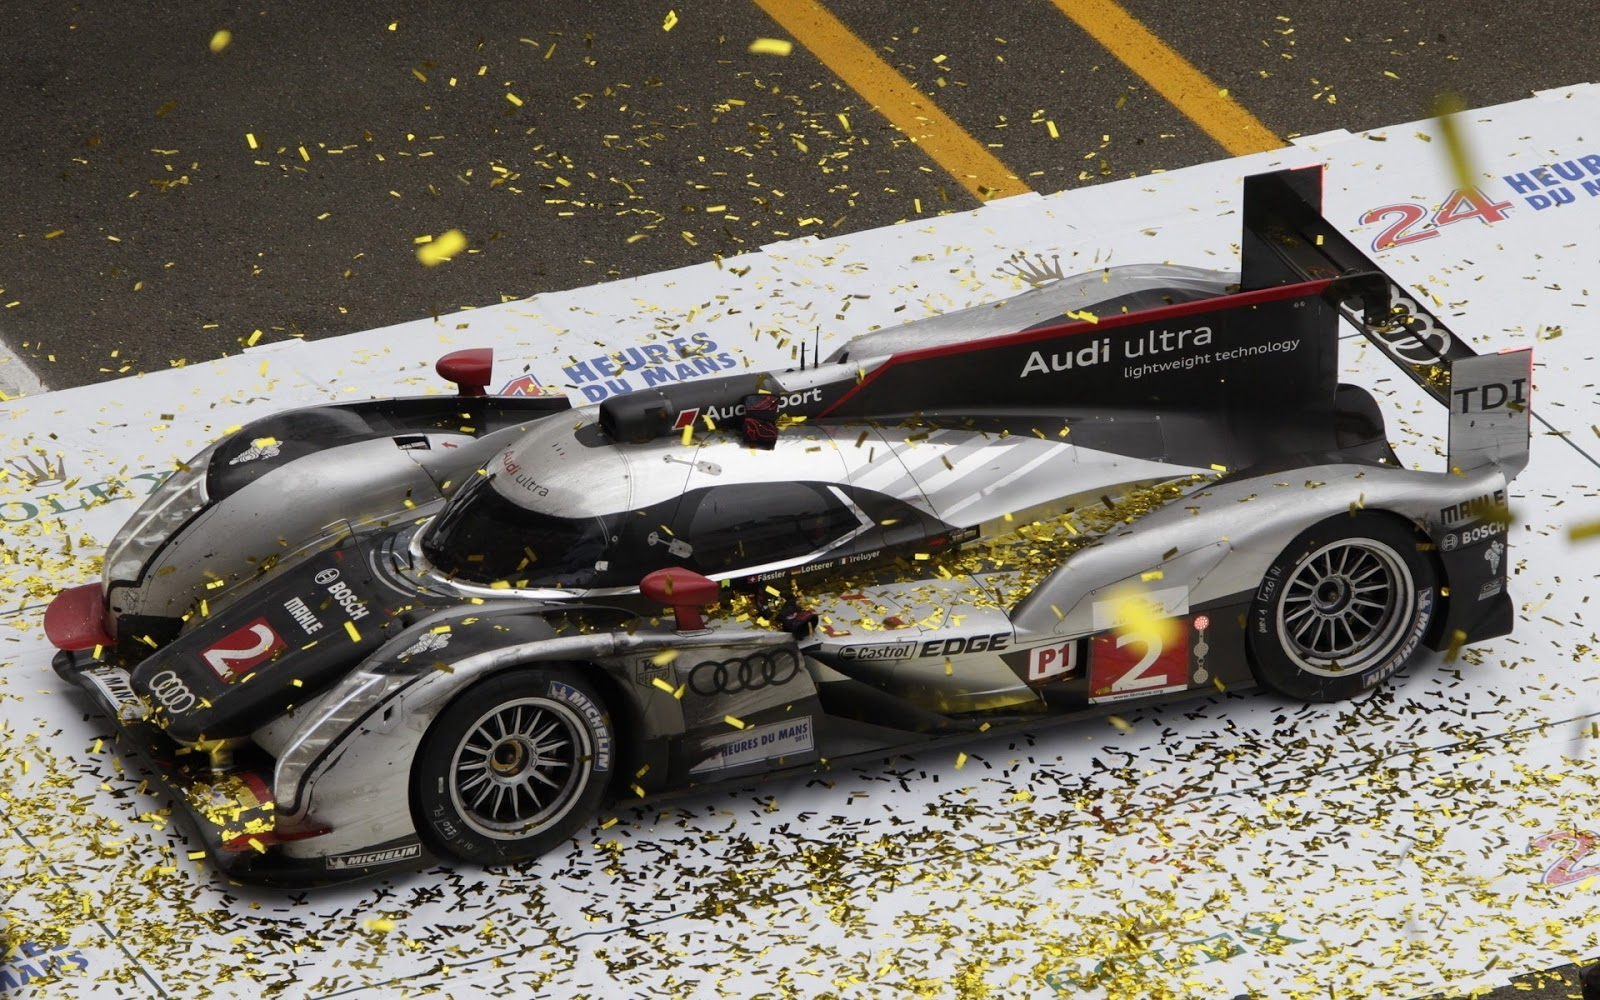 Audi Ultra R18 TDI Le Mans